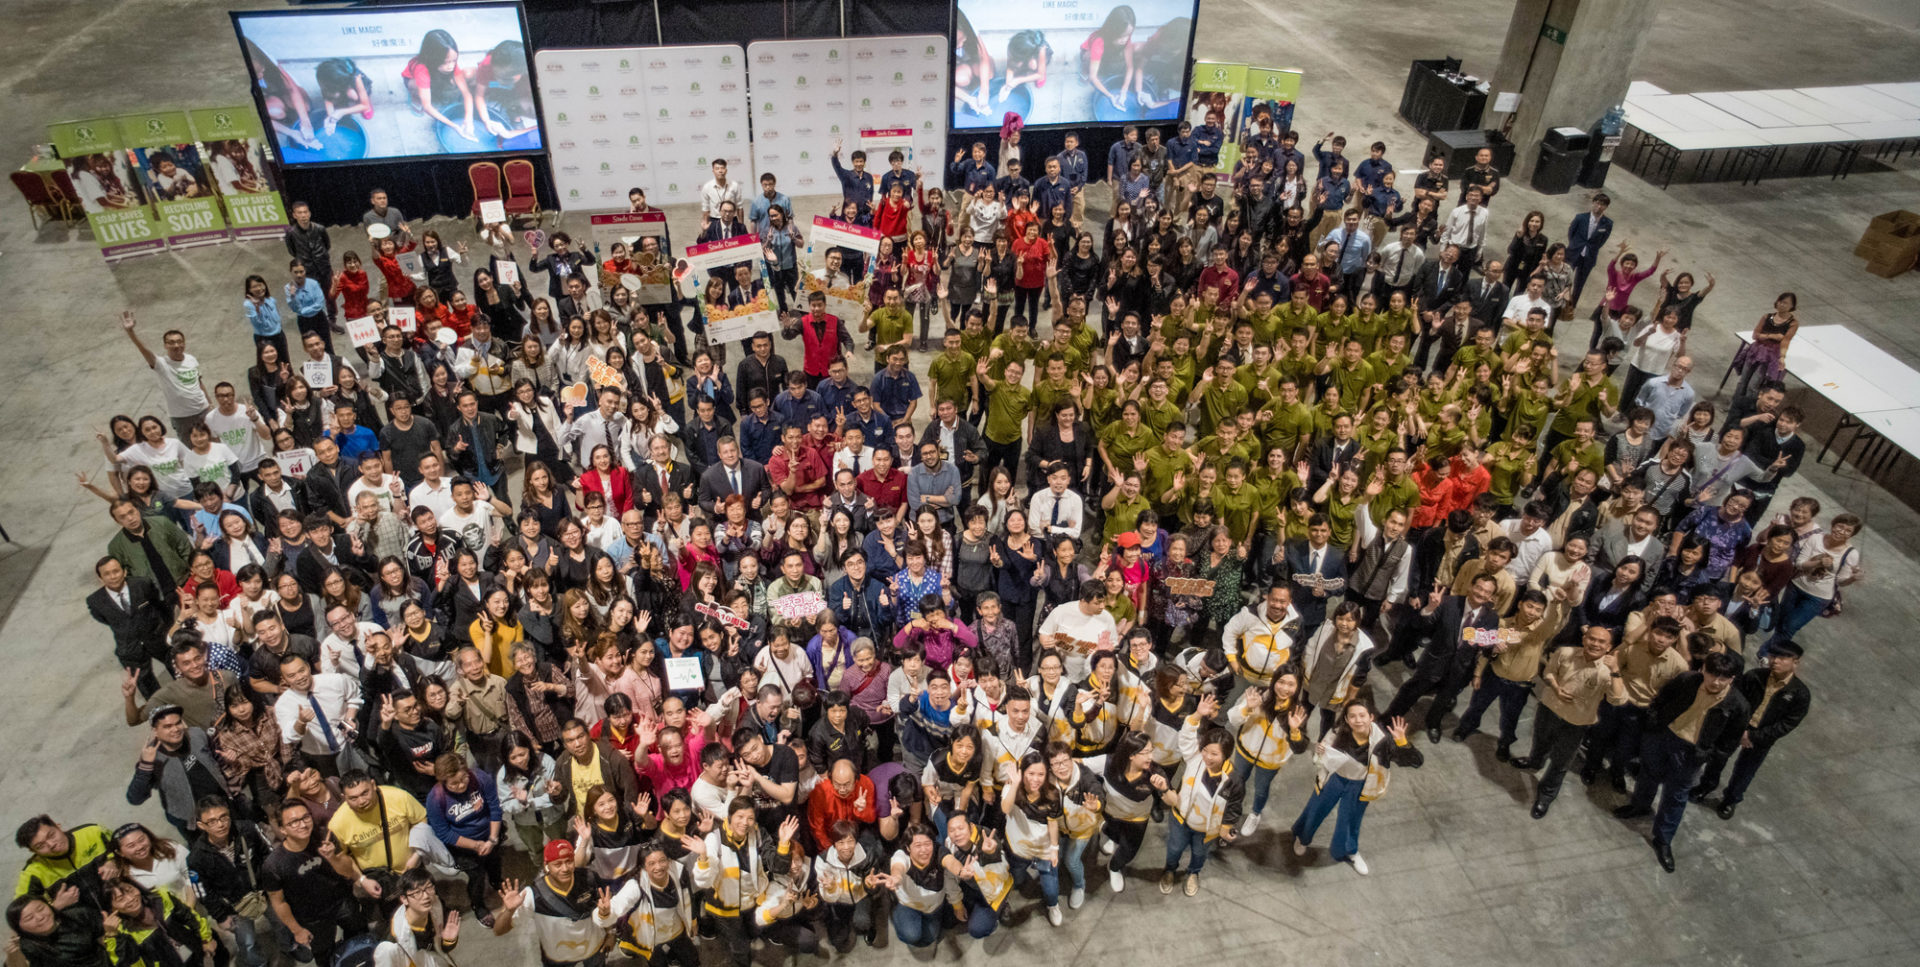 Sanda China and Clean the World Asia - Charity event in Macau